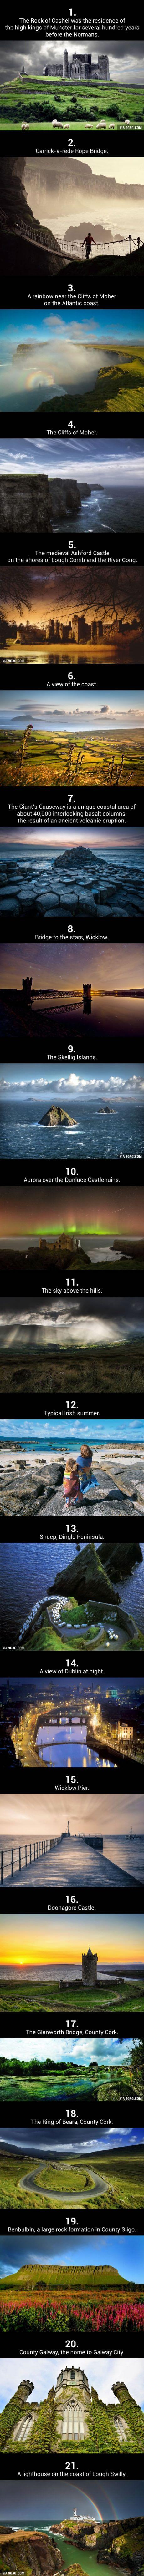 21 Reasons You Definitely Need To Visit Ireland